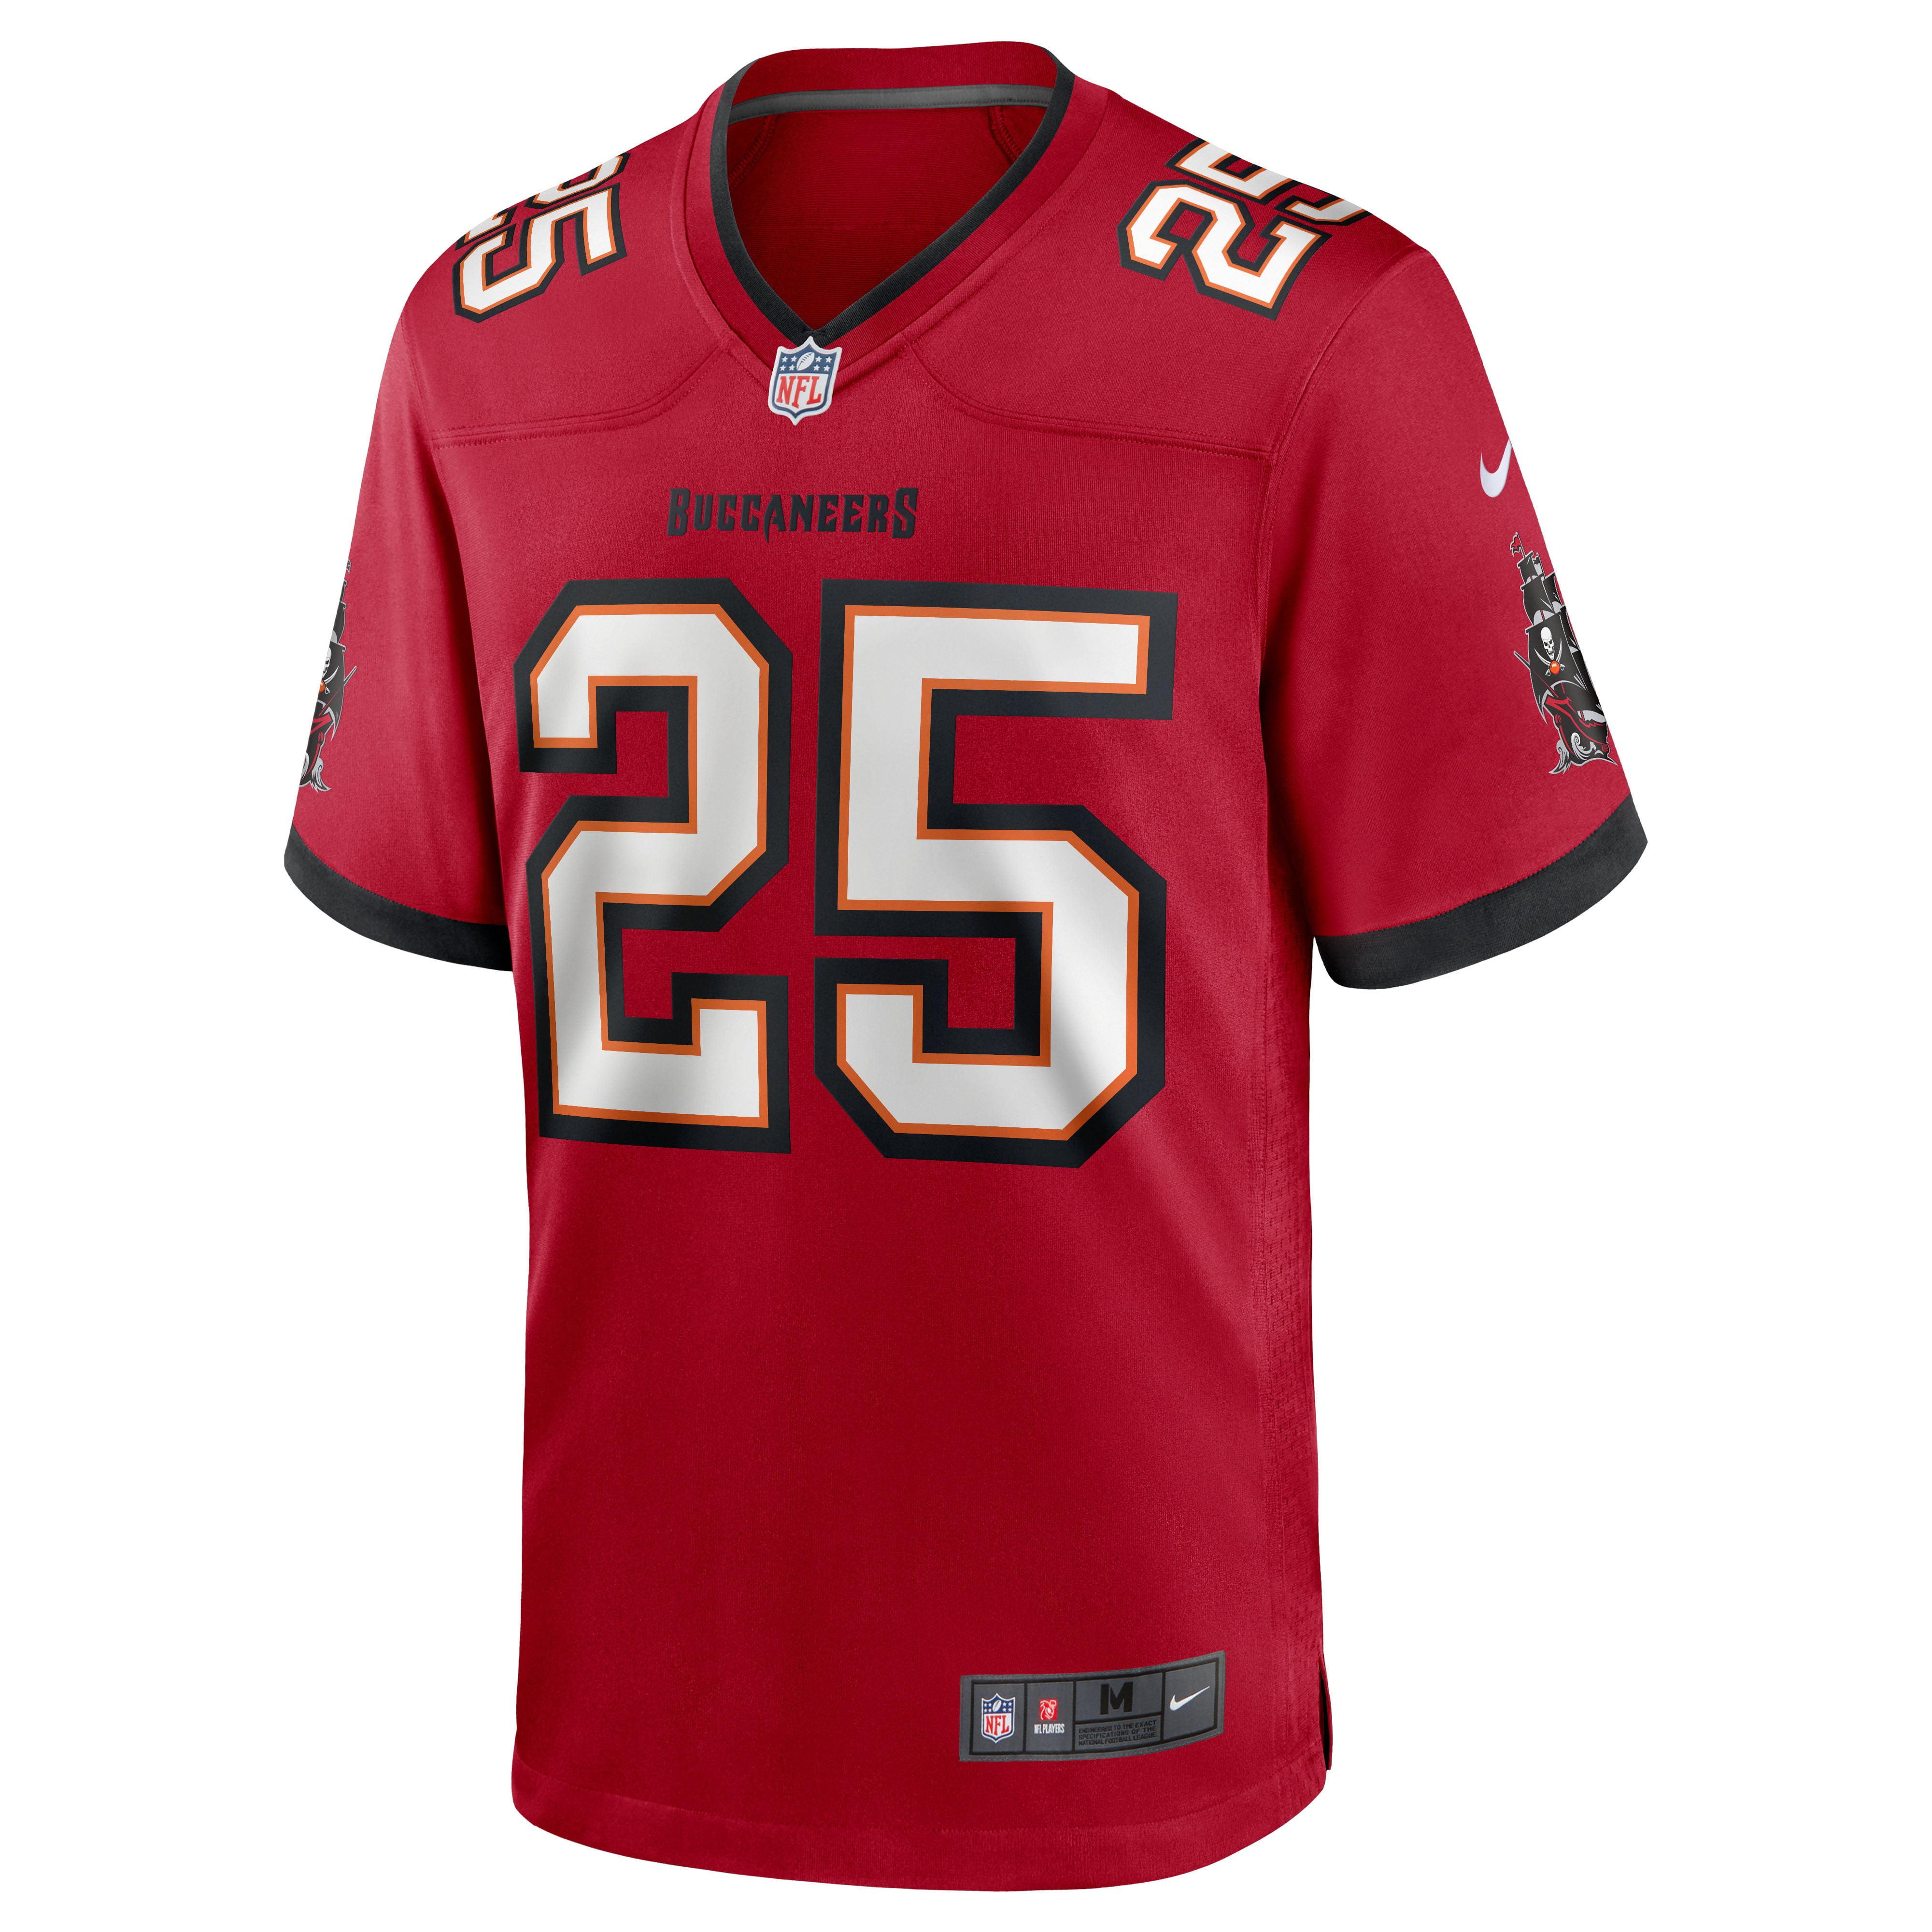 LeSean McCoy Tampa Bay Buccaneers Nike Team Game Jersey - Red